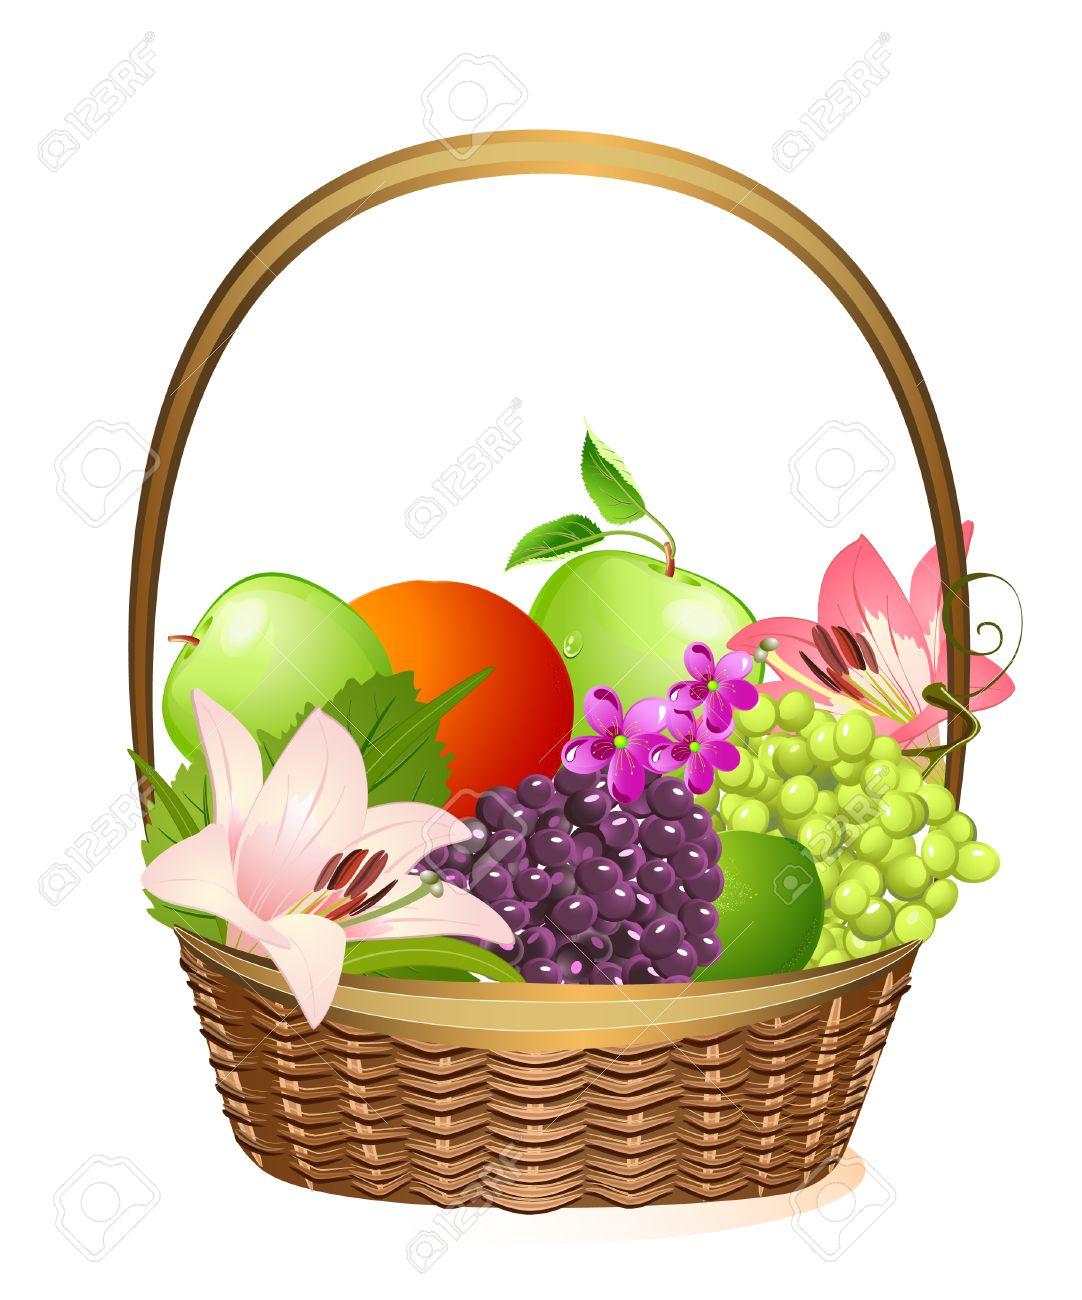 wicker fruit basket with flowers Stock Vector - 6795649